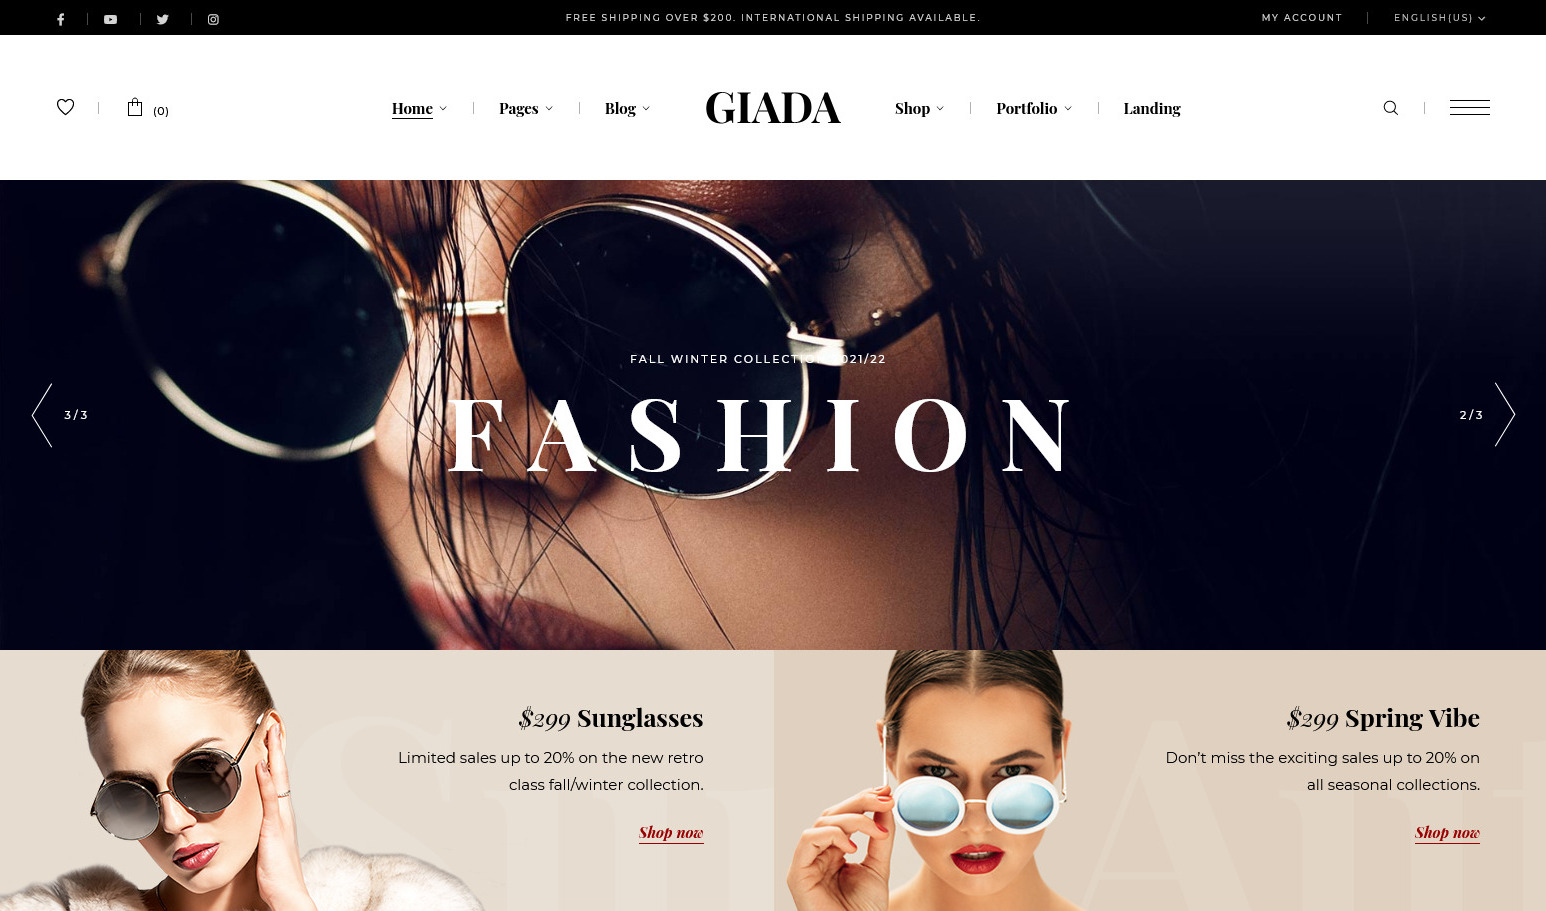 Giada Multipurpose Jewelry and Watch Store Theme